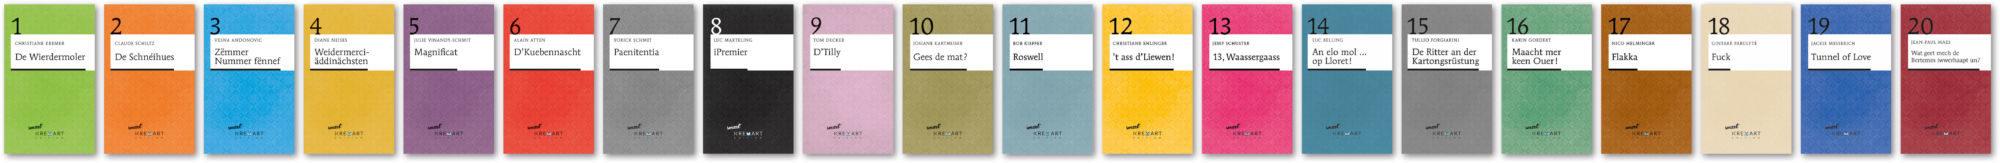 Smartbooks_01-20_streng_1_R